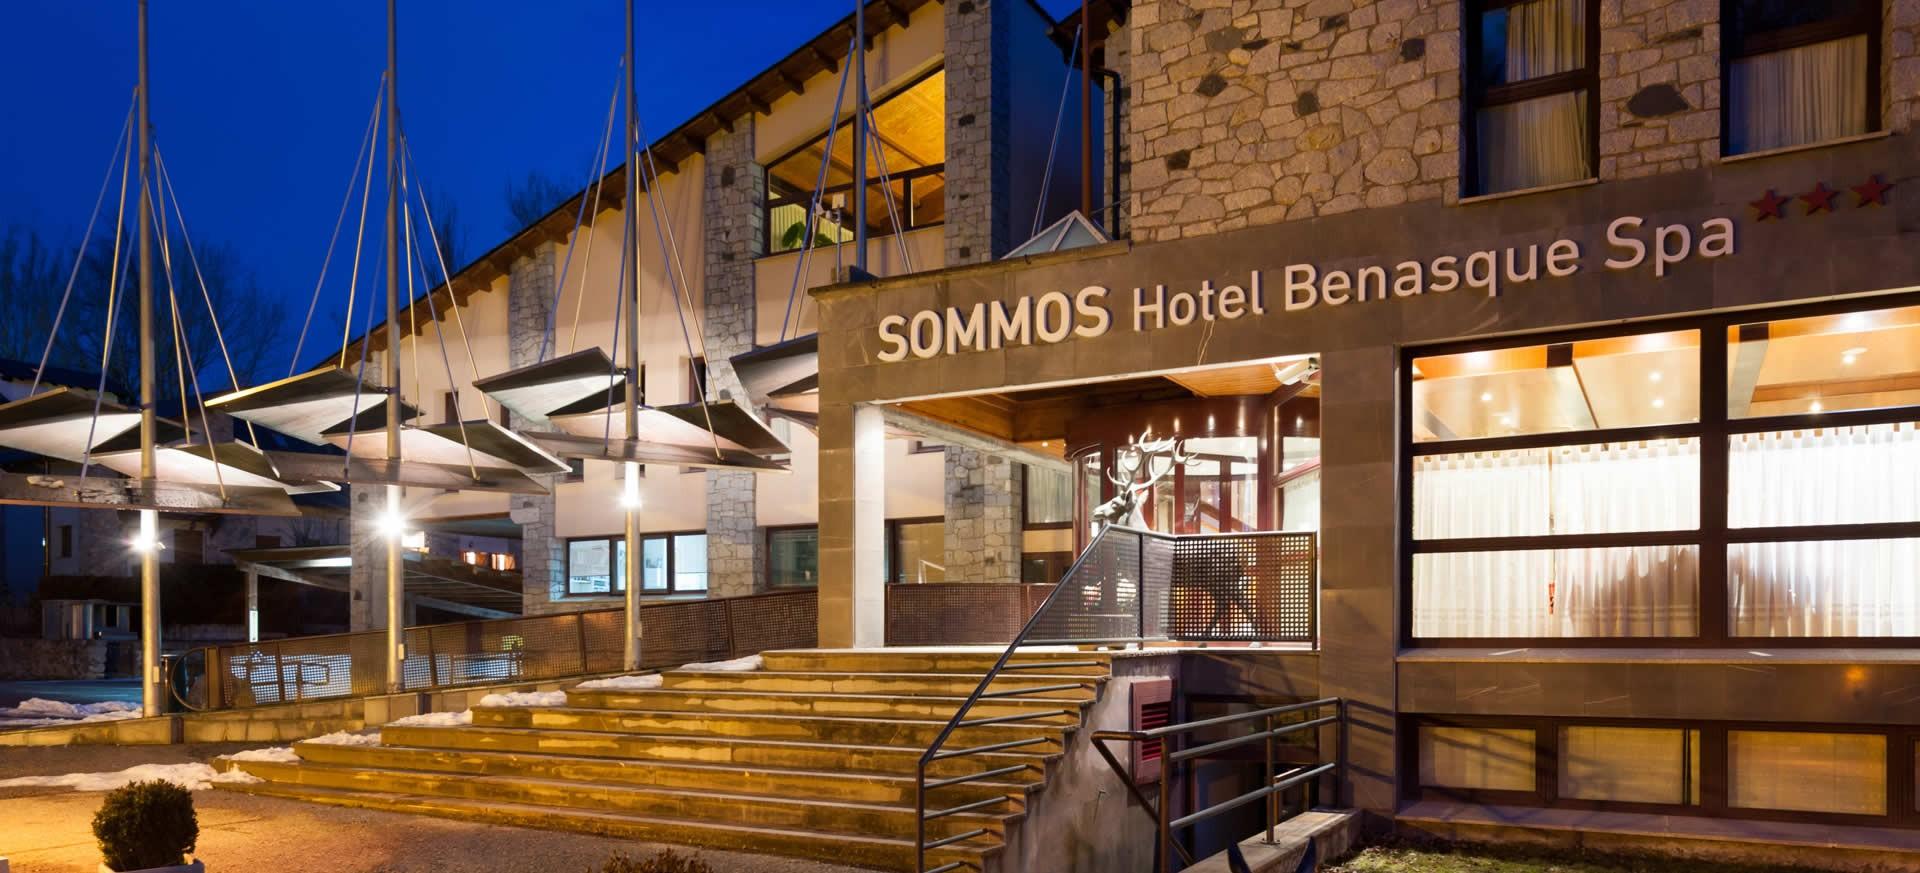 sommos-hotel-benasque-spa-home-hotel-S_1_24